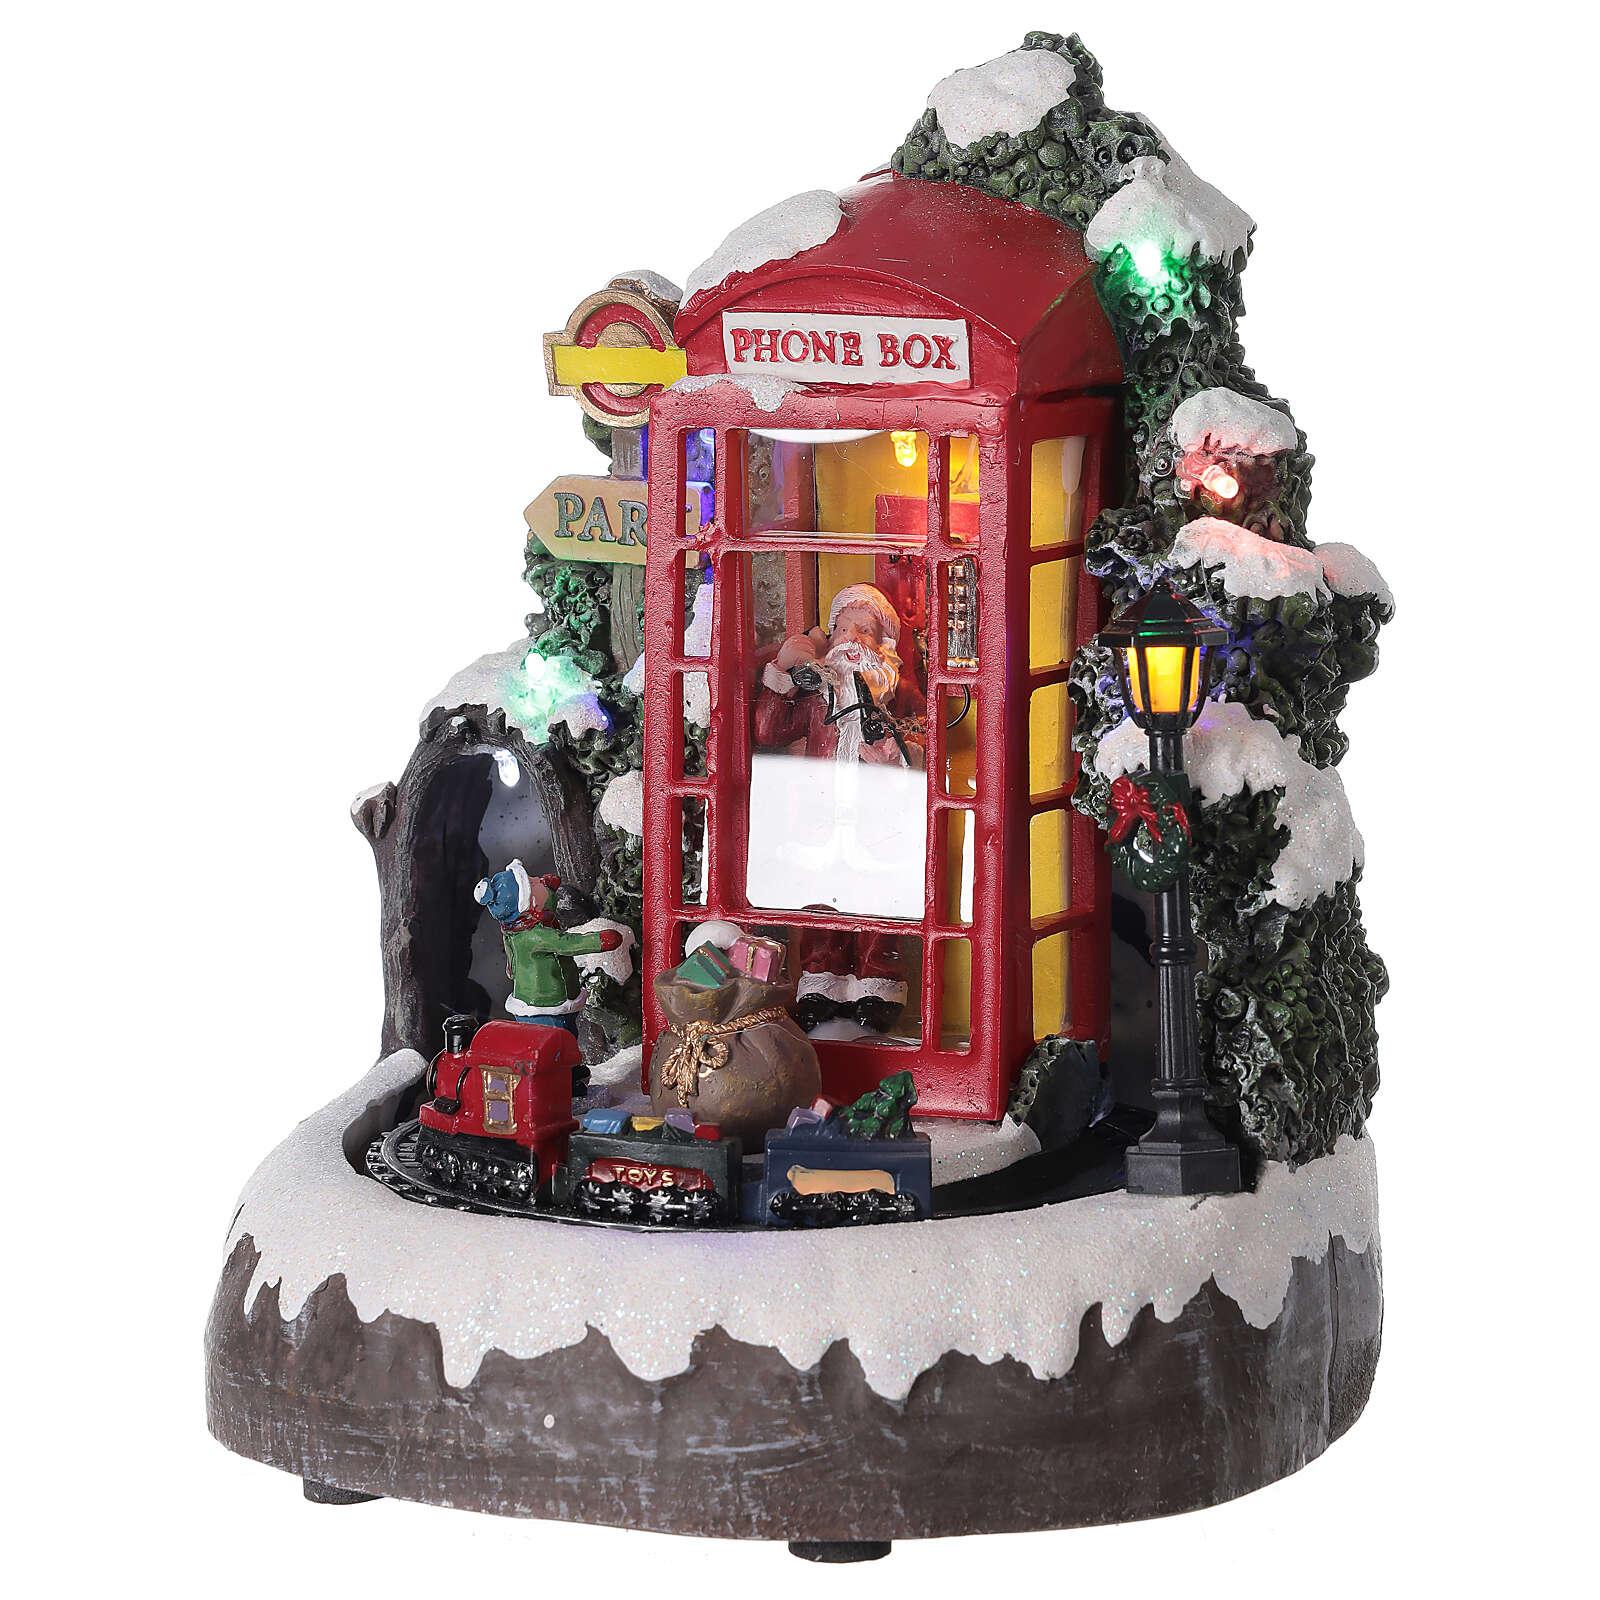 Phone booth Santa Claus village with train lights music 20x20x20 cm 3